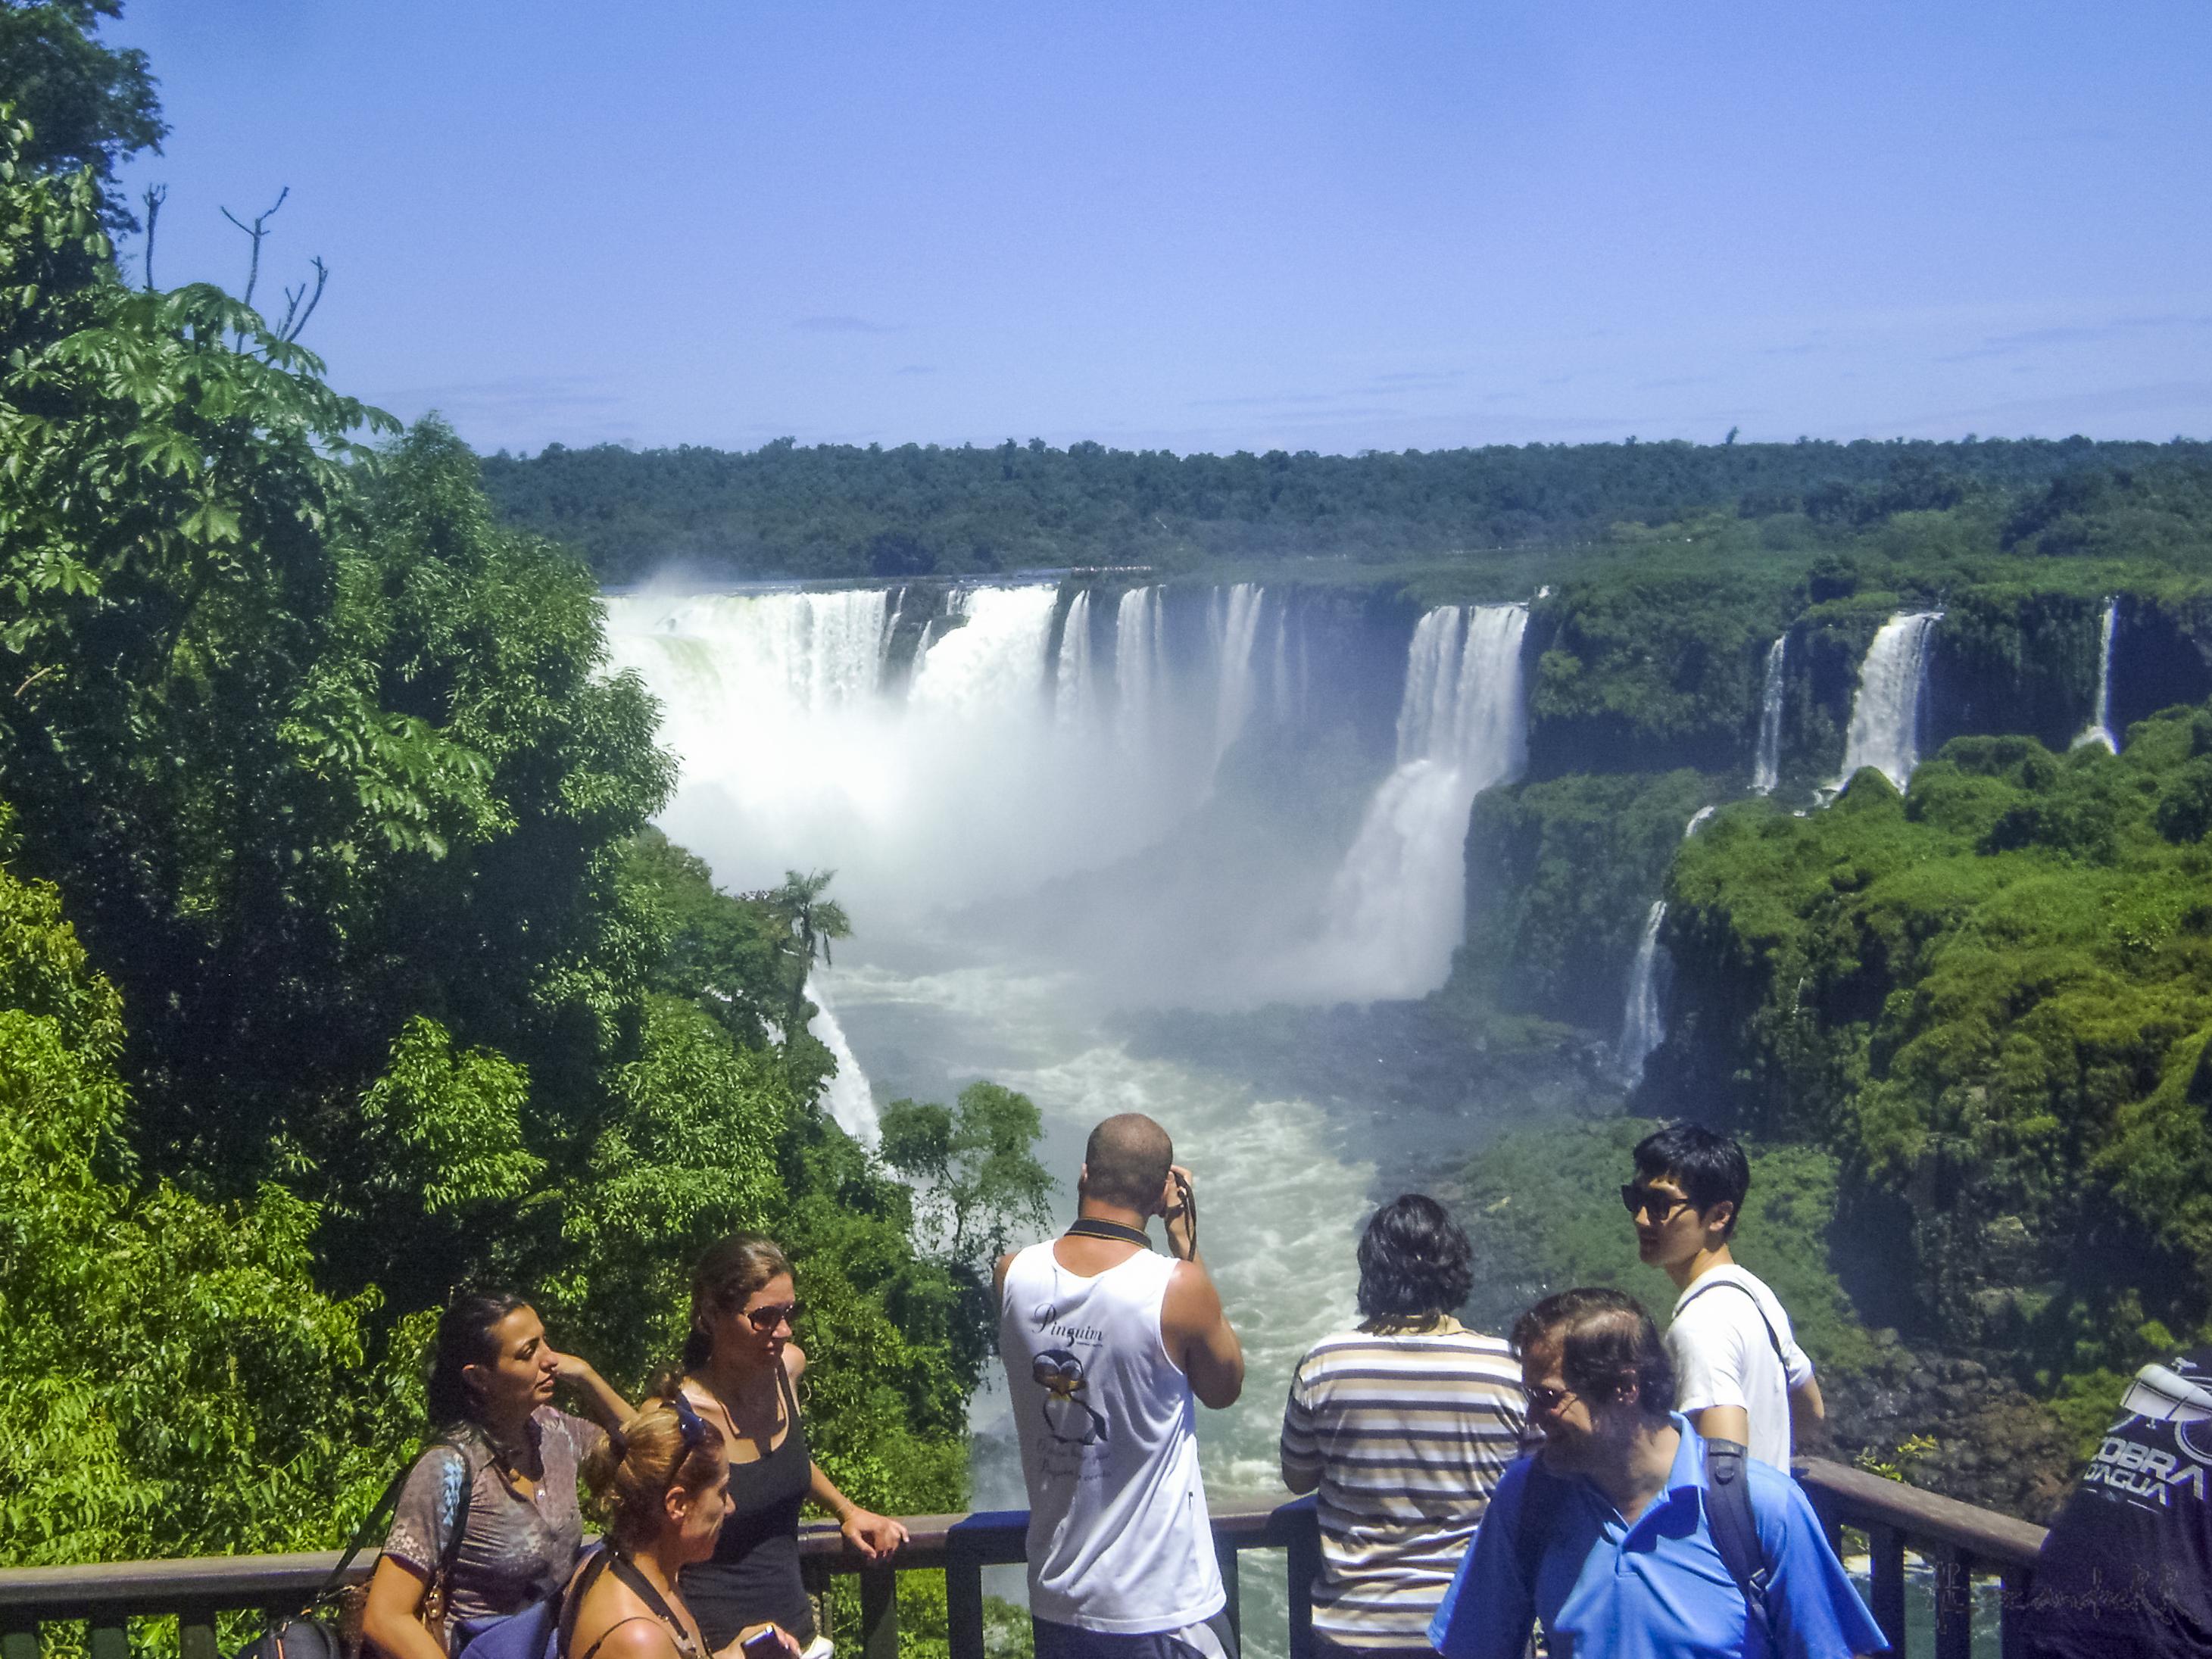 Foz do Iguaçu Paraná fonte: upload.wikimedia.org